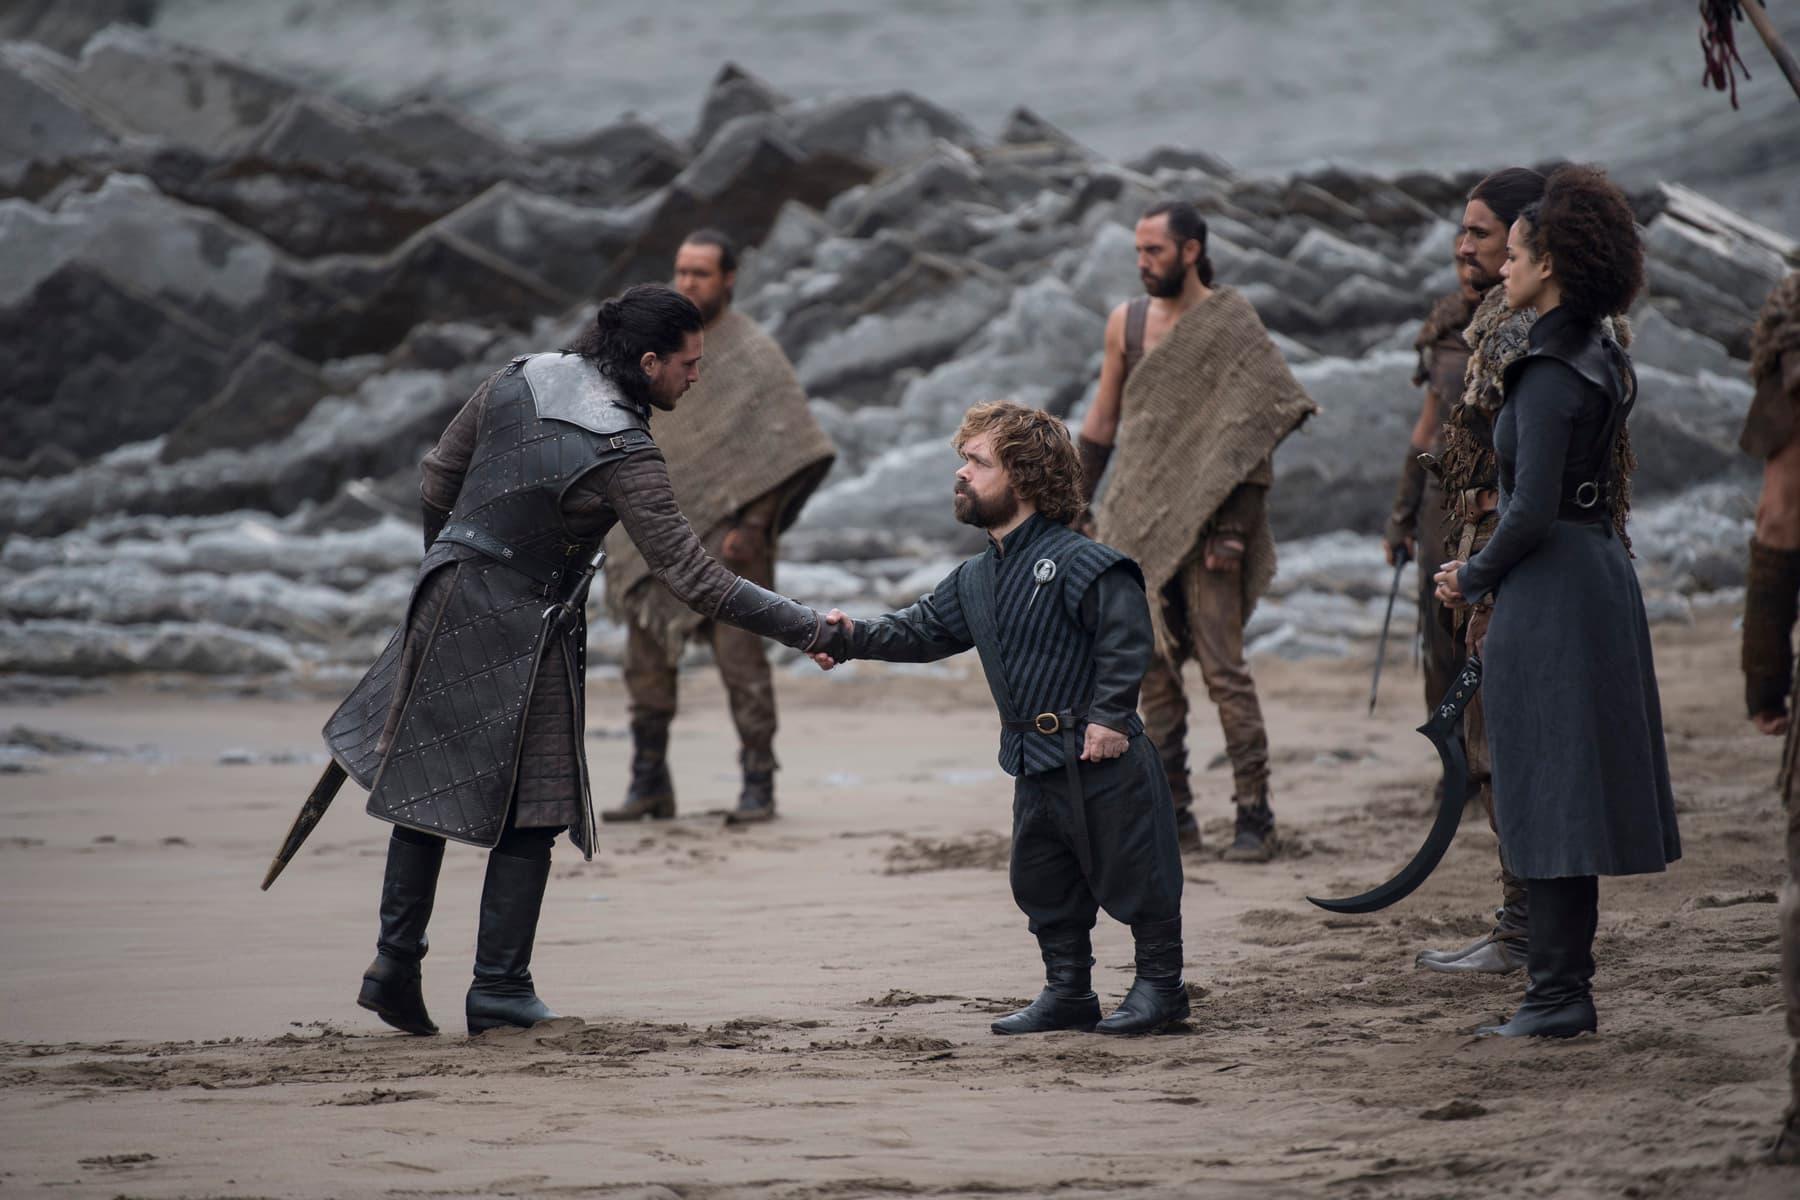 'Game of Thrones' Actors Say Good-Bye to the Series via Instagram